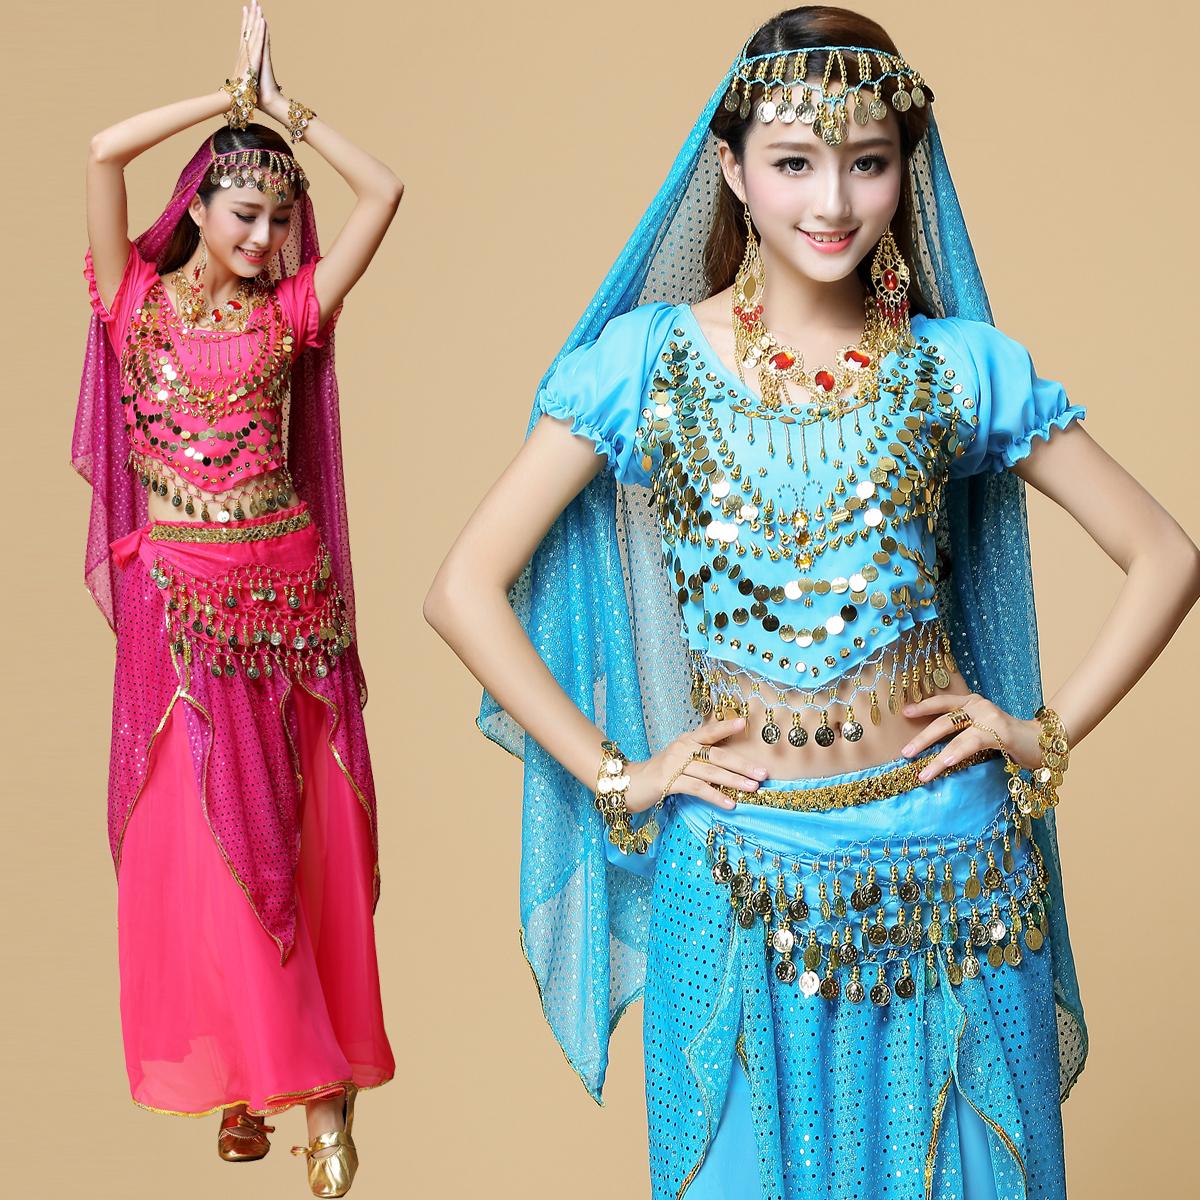 костюм для танца живота Yanmei Hui 2069 костюм для танца живота waves are small ll0004 lq0013